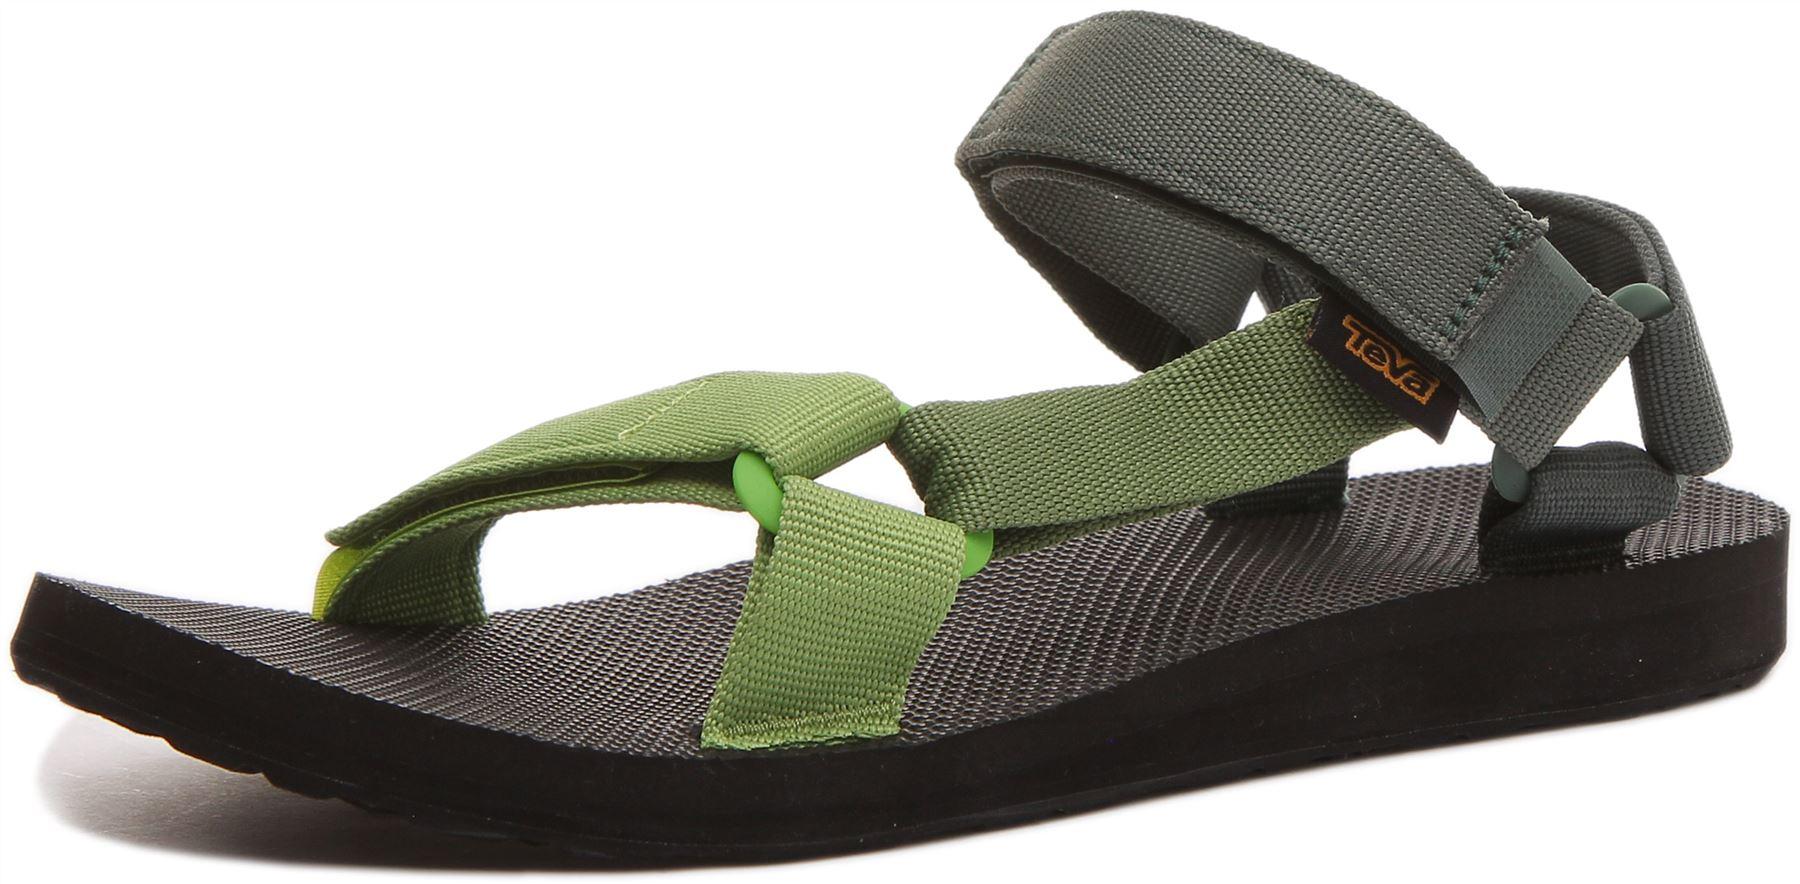 miniatura 12 - Teva Original Universal Da Uomo Con Cinturino Sandalo in Verde Taglia UK 6 - 12